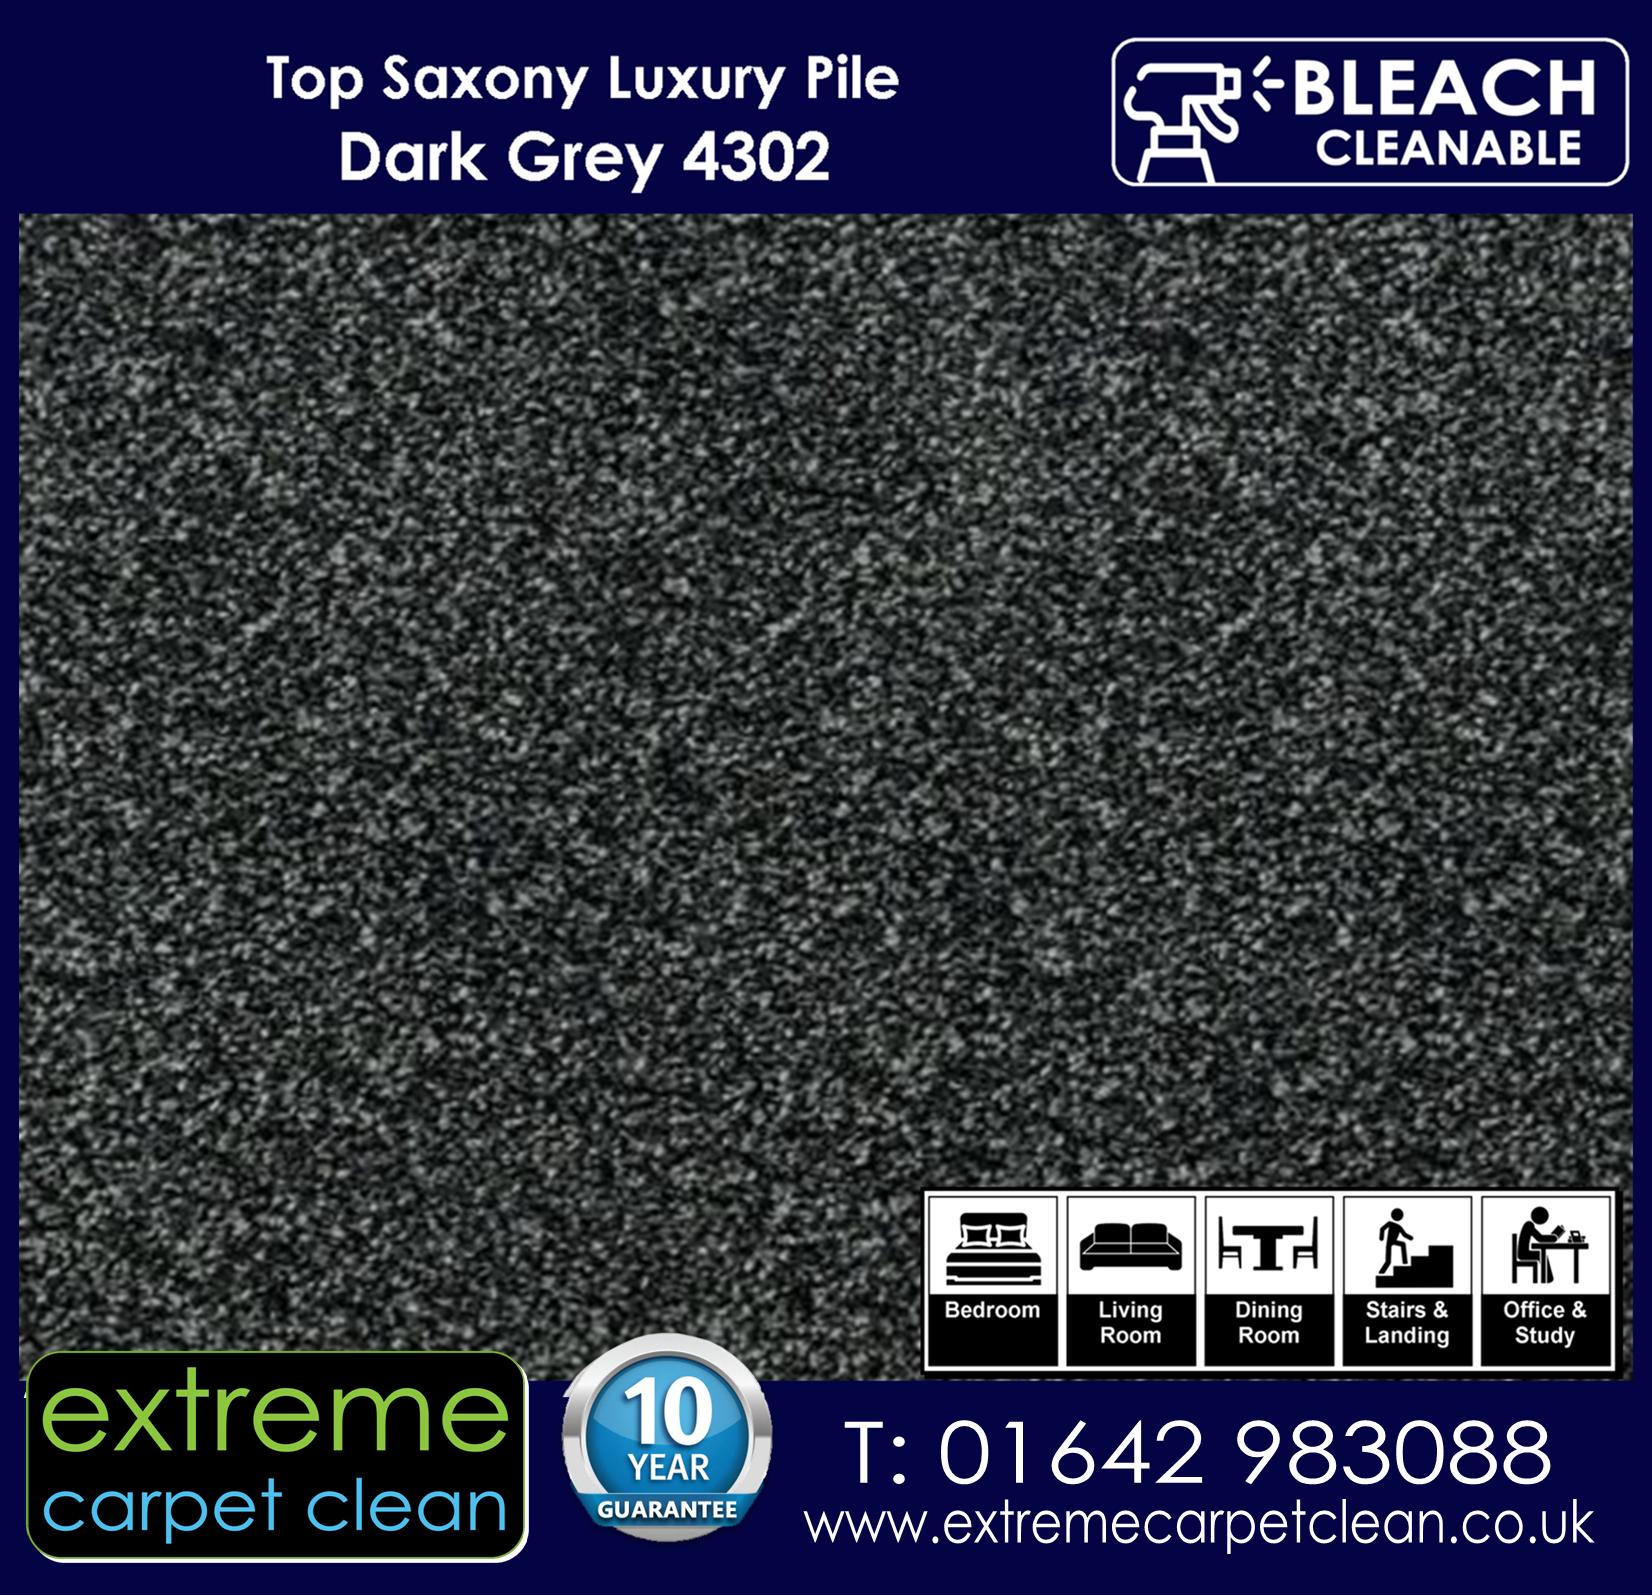 Extreme Carpet Clean Top Saxony DARK GREY 4302